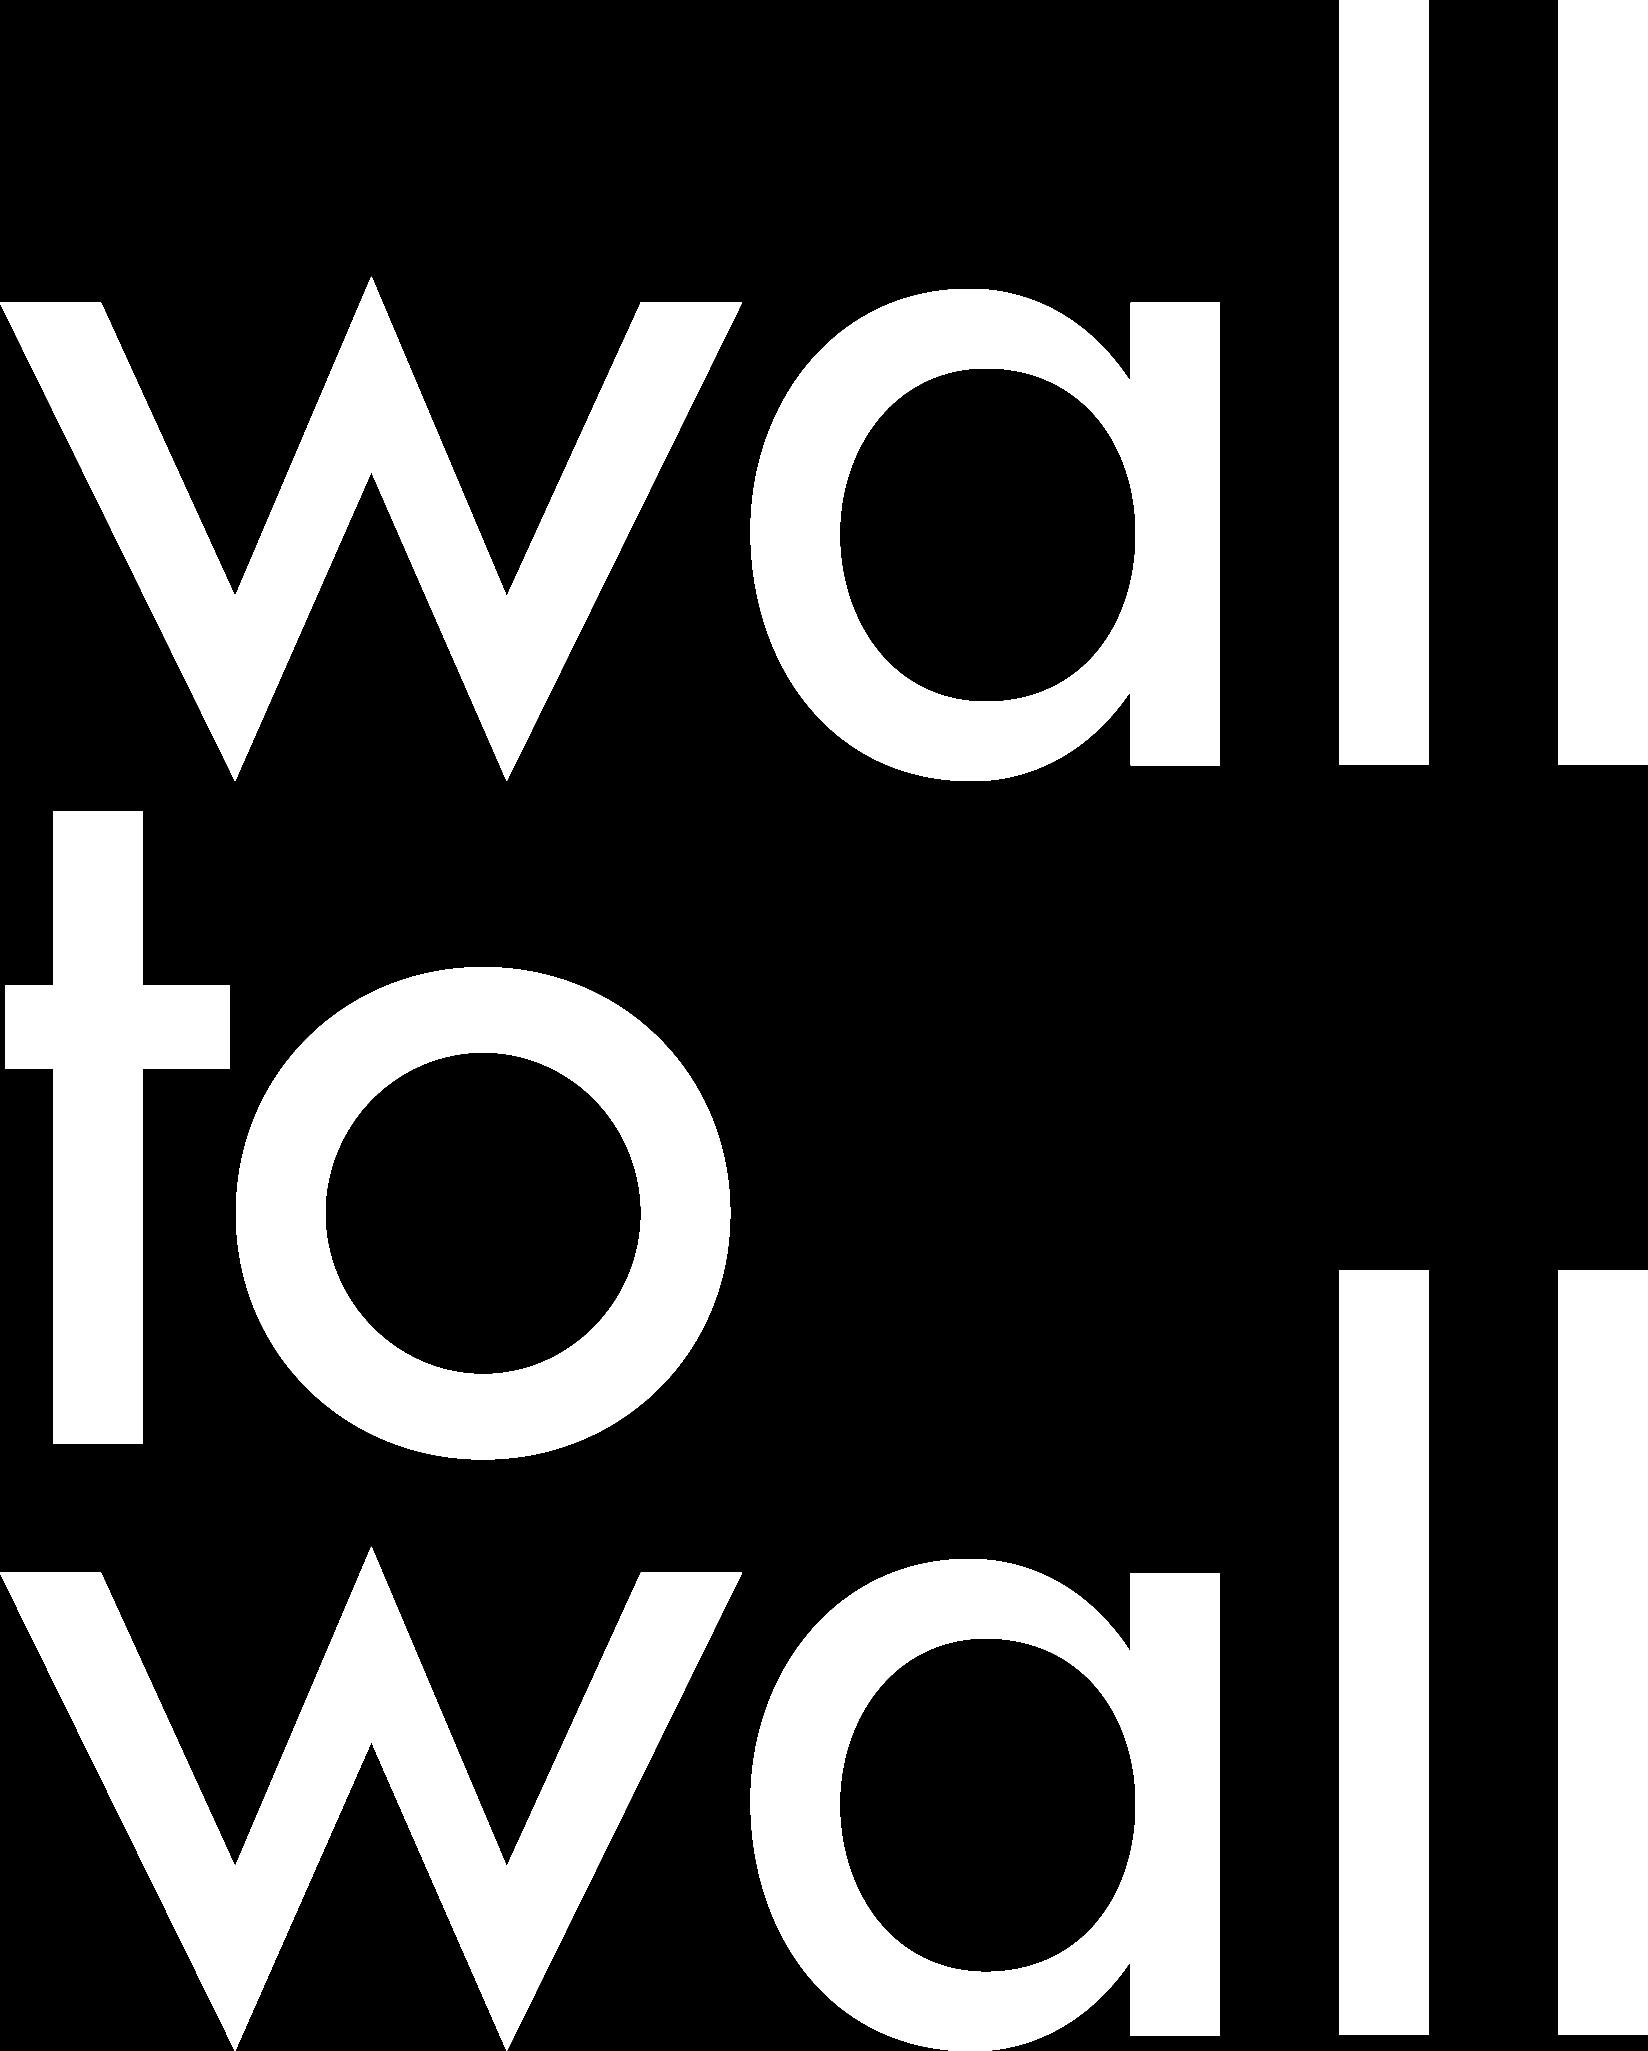 walltowall.jpg